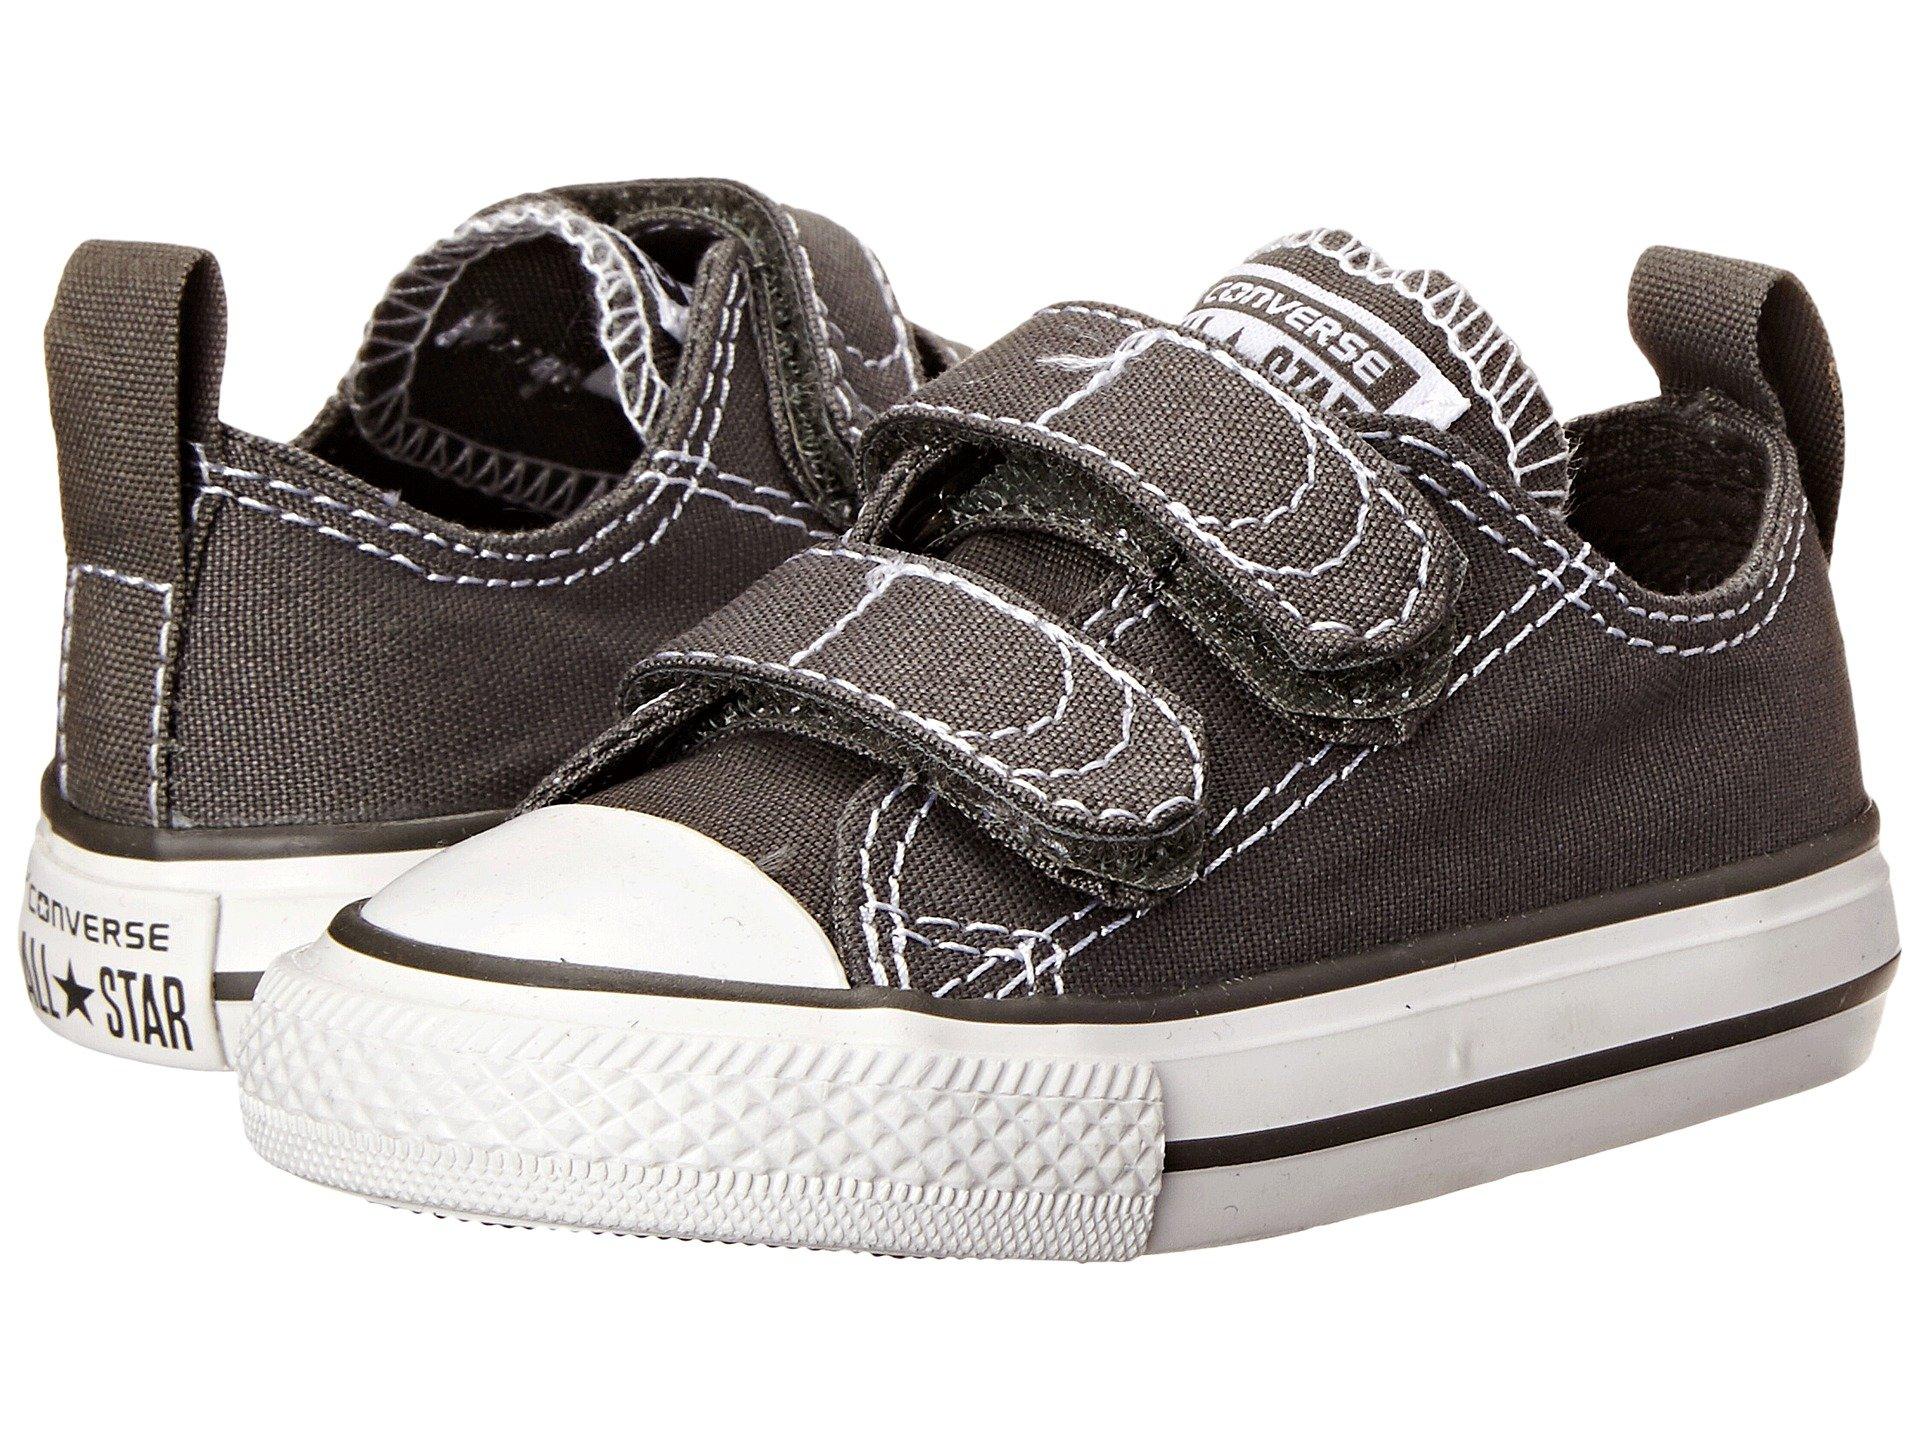 Converse Kids' Chuck Taylor 2v Ox (Infant/Toddler) (2 M US Infant, Charcoal/White)